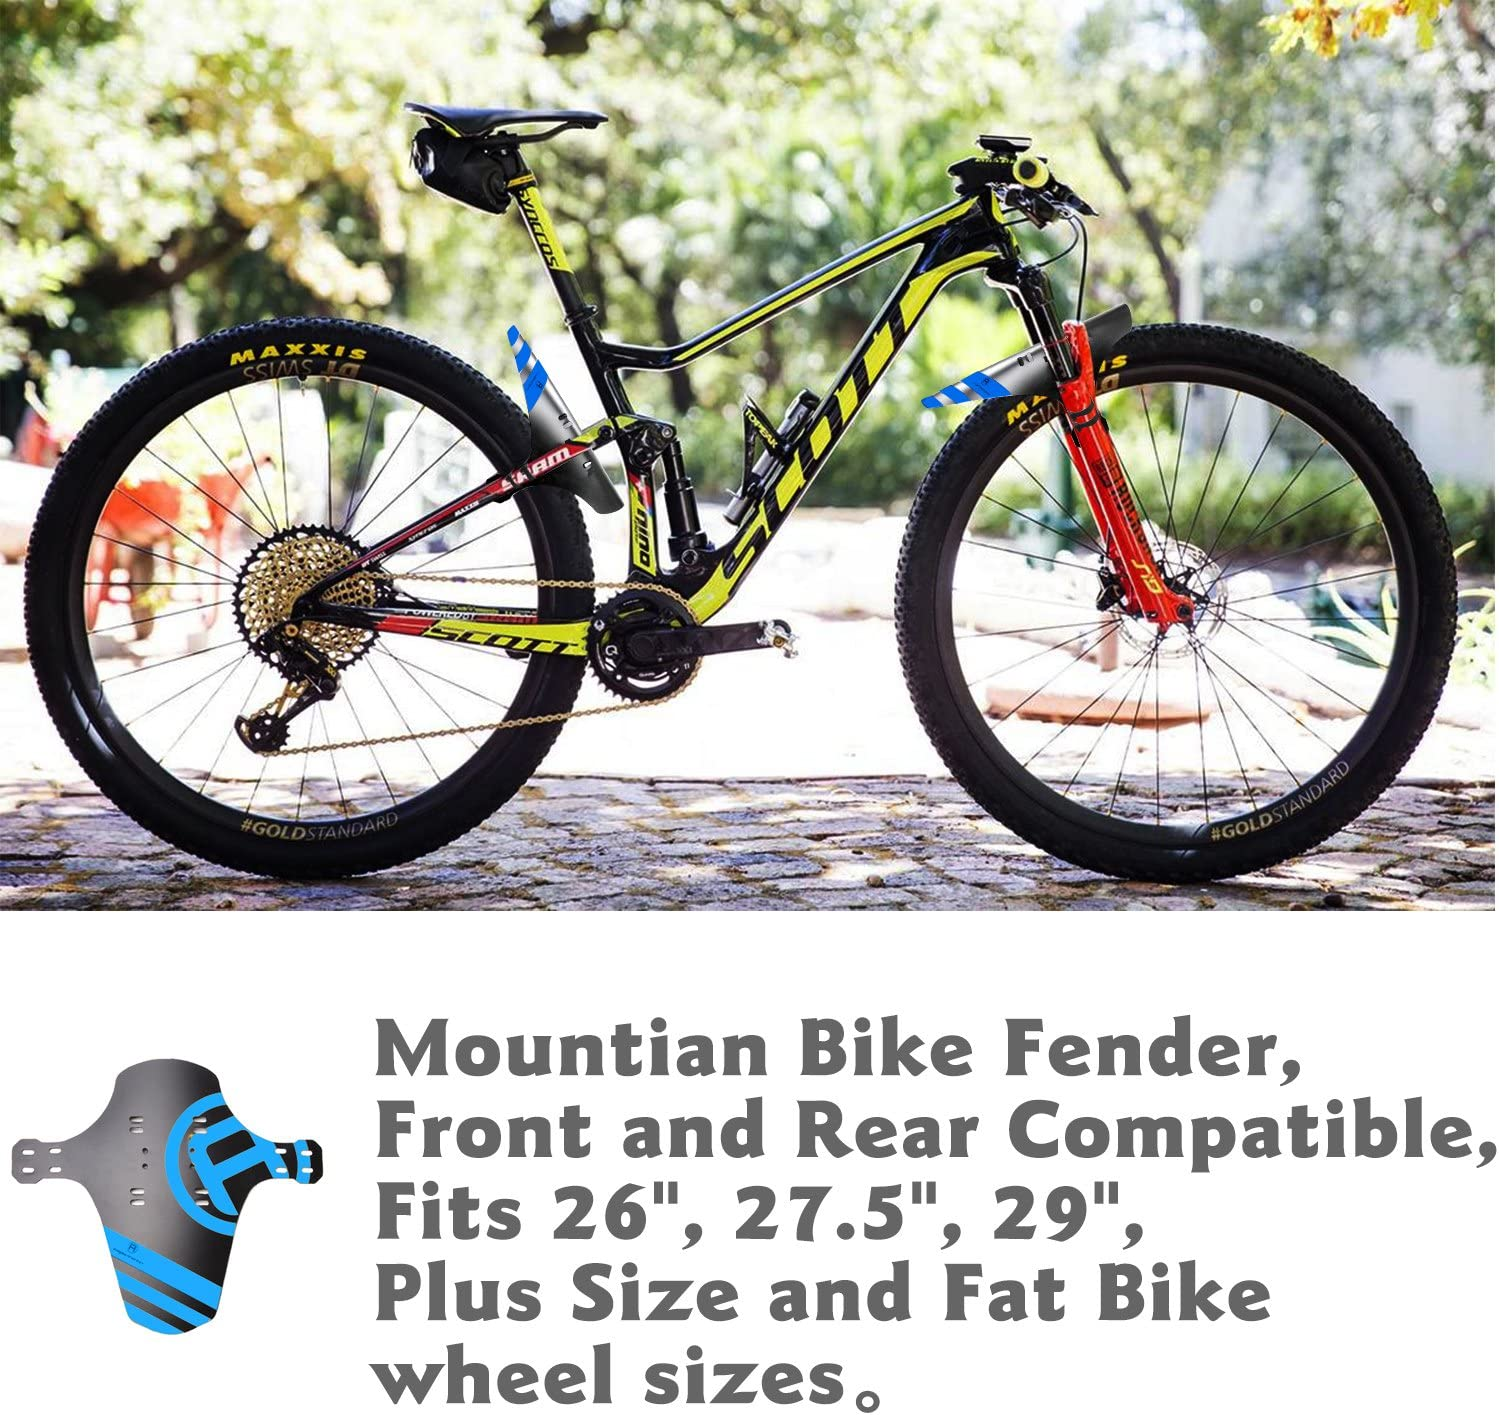 "NICEDACK Mud Guard 2Pcs MTB Bicycle Mudguards for 26/"" 650B 27.5/"" 29/"" MTB Bike"